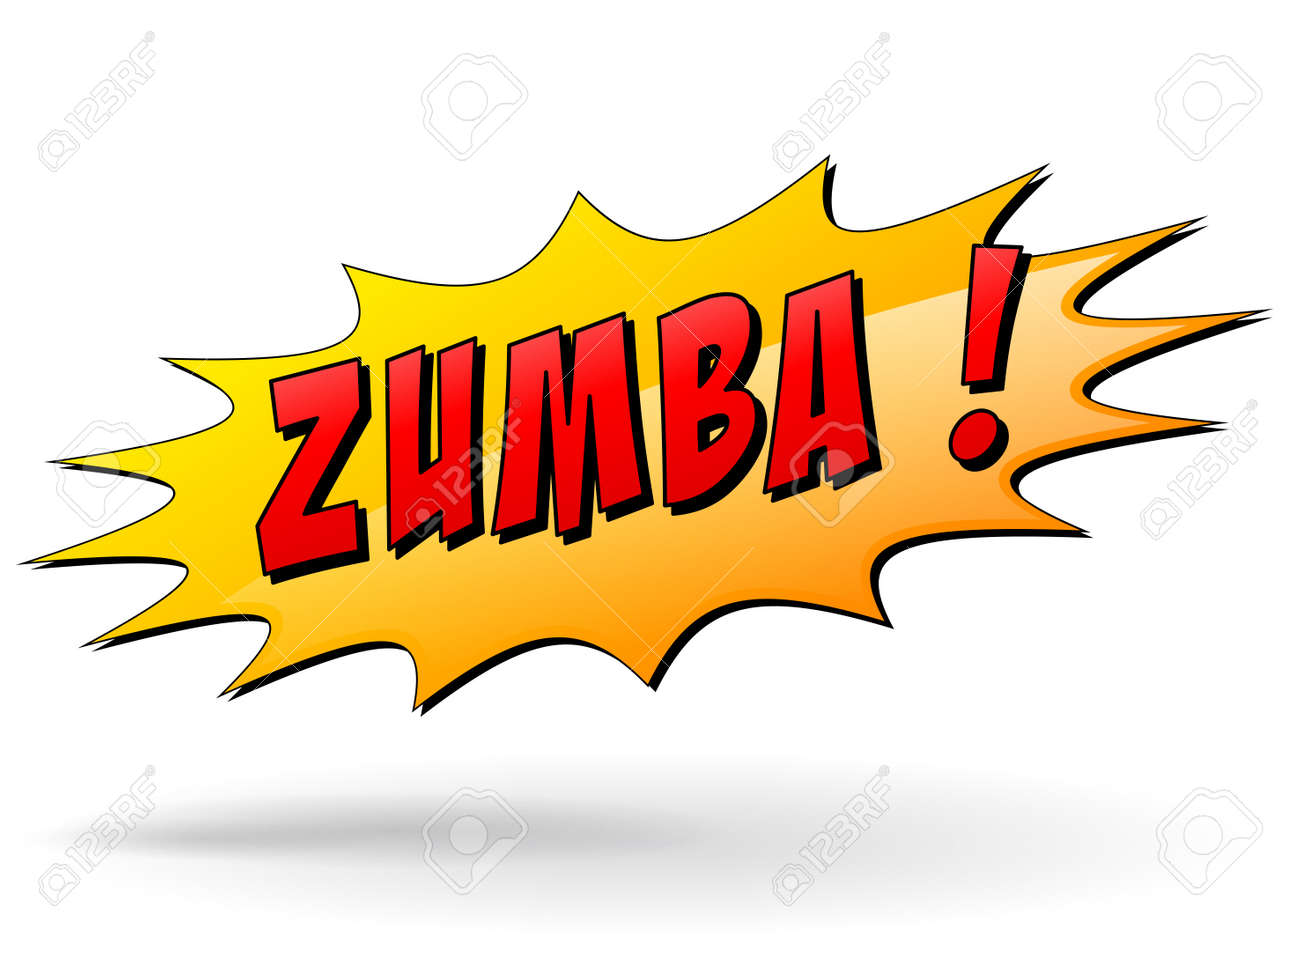 vector illustration of zumba starburst icon concept royalty free rh 123rf com zumba free vector zumba logo vector download